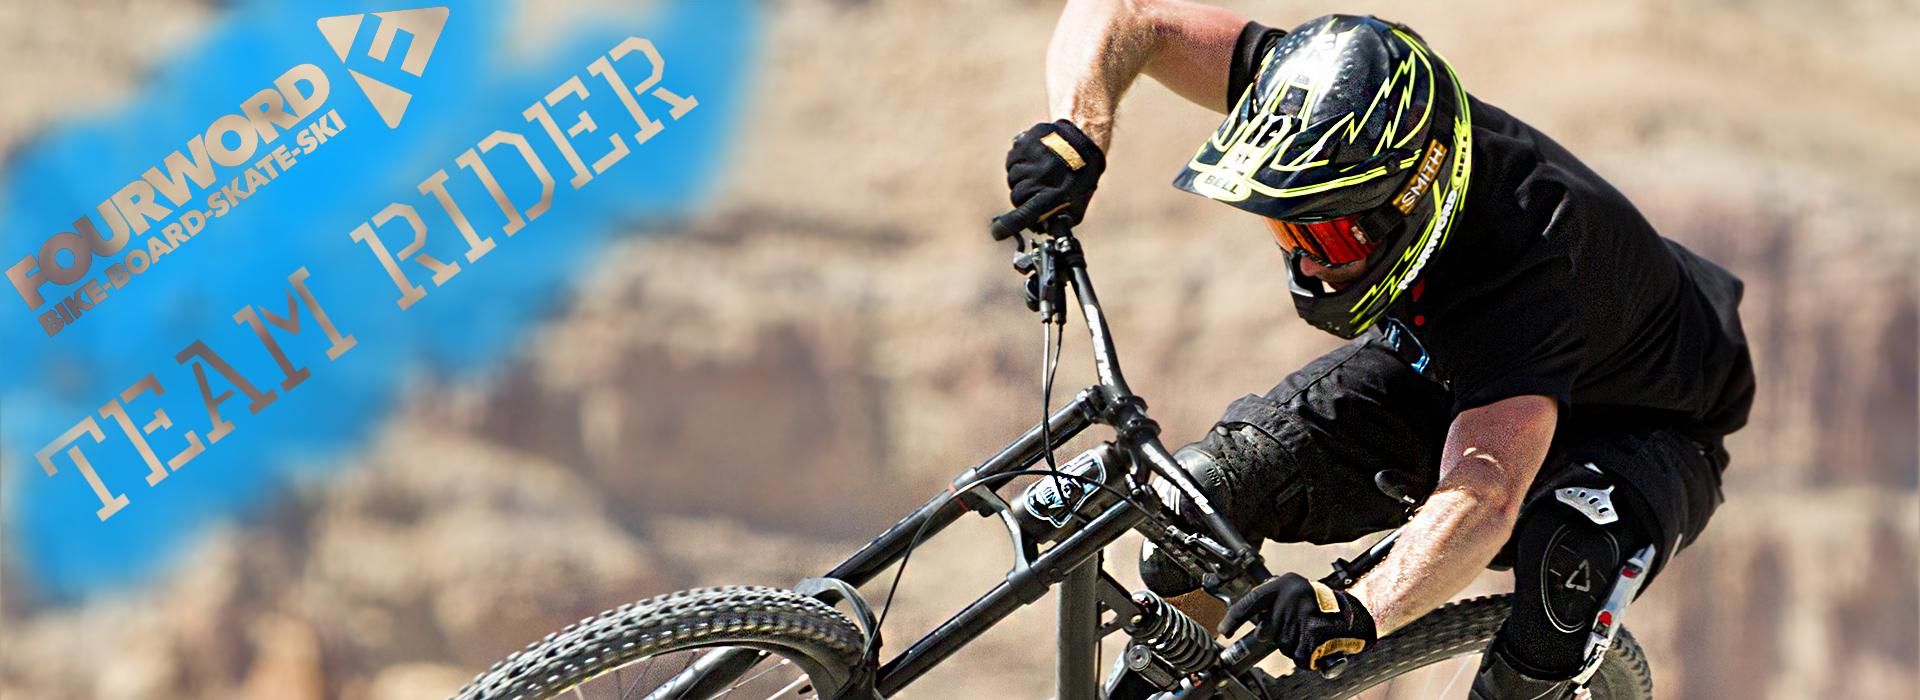 Team-Rider